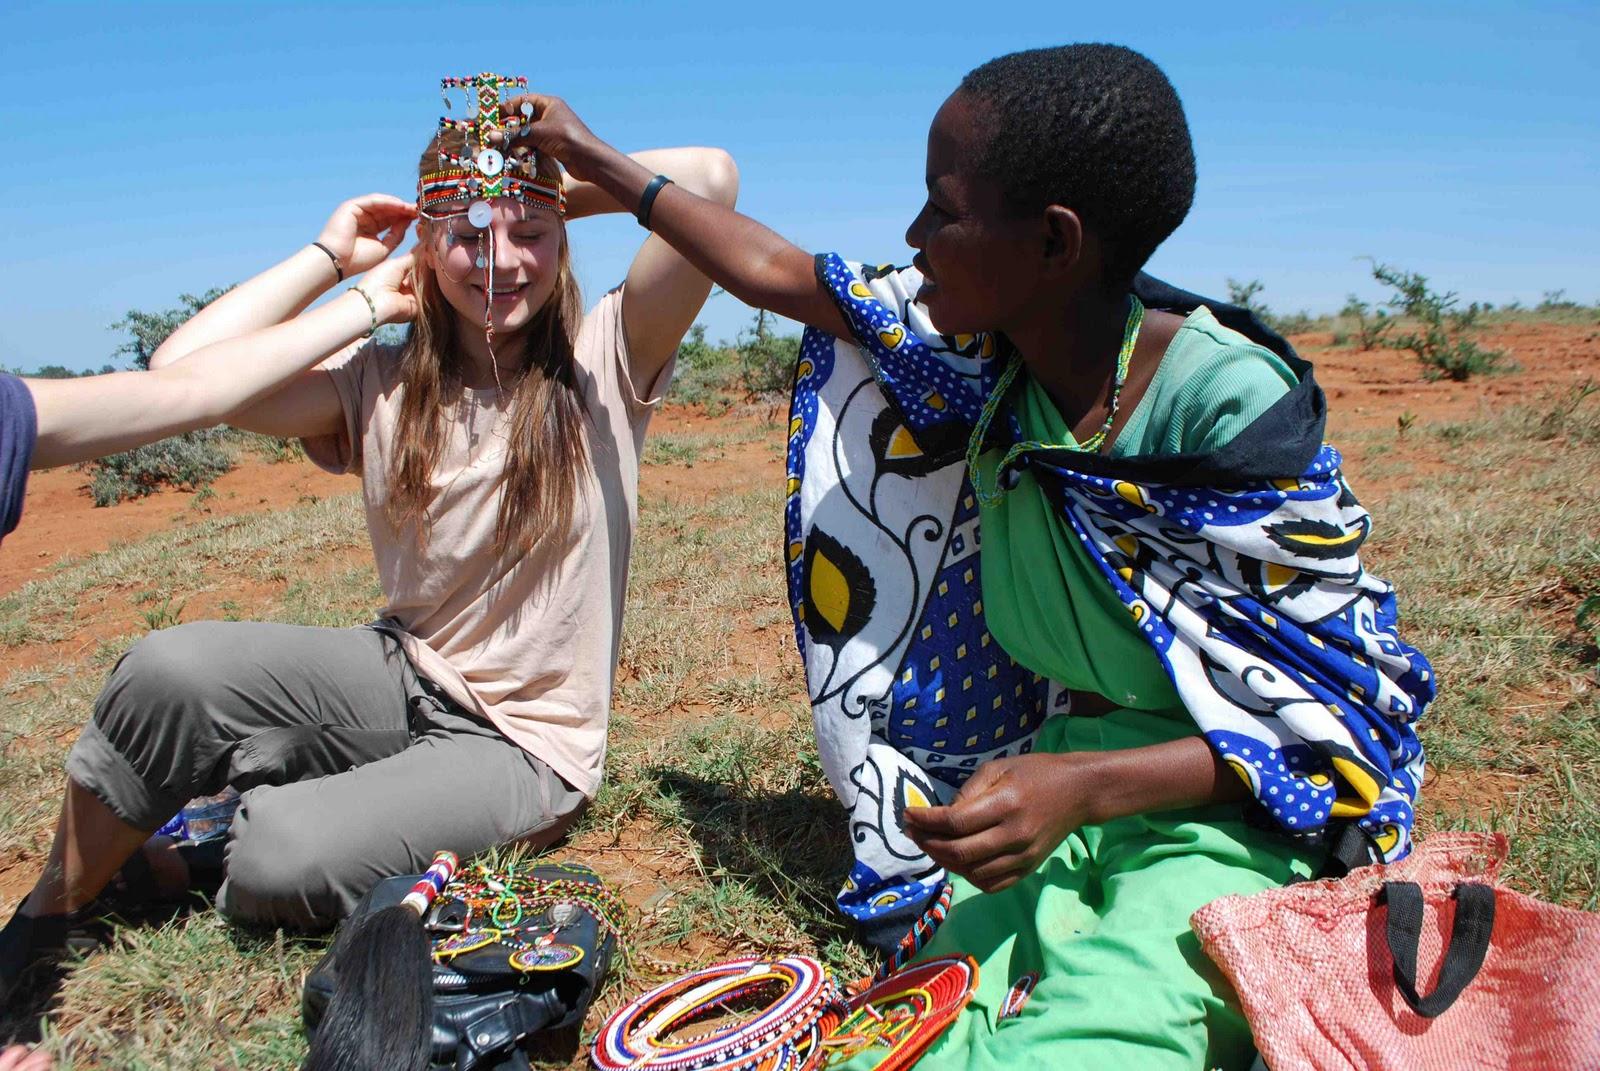 Verden ifølge Gry: Den mobile Masai